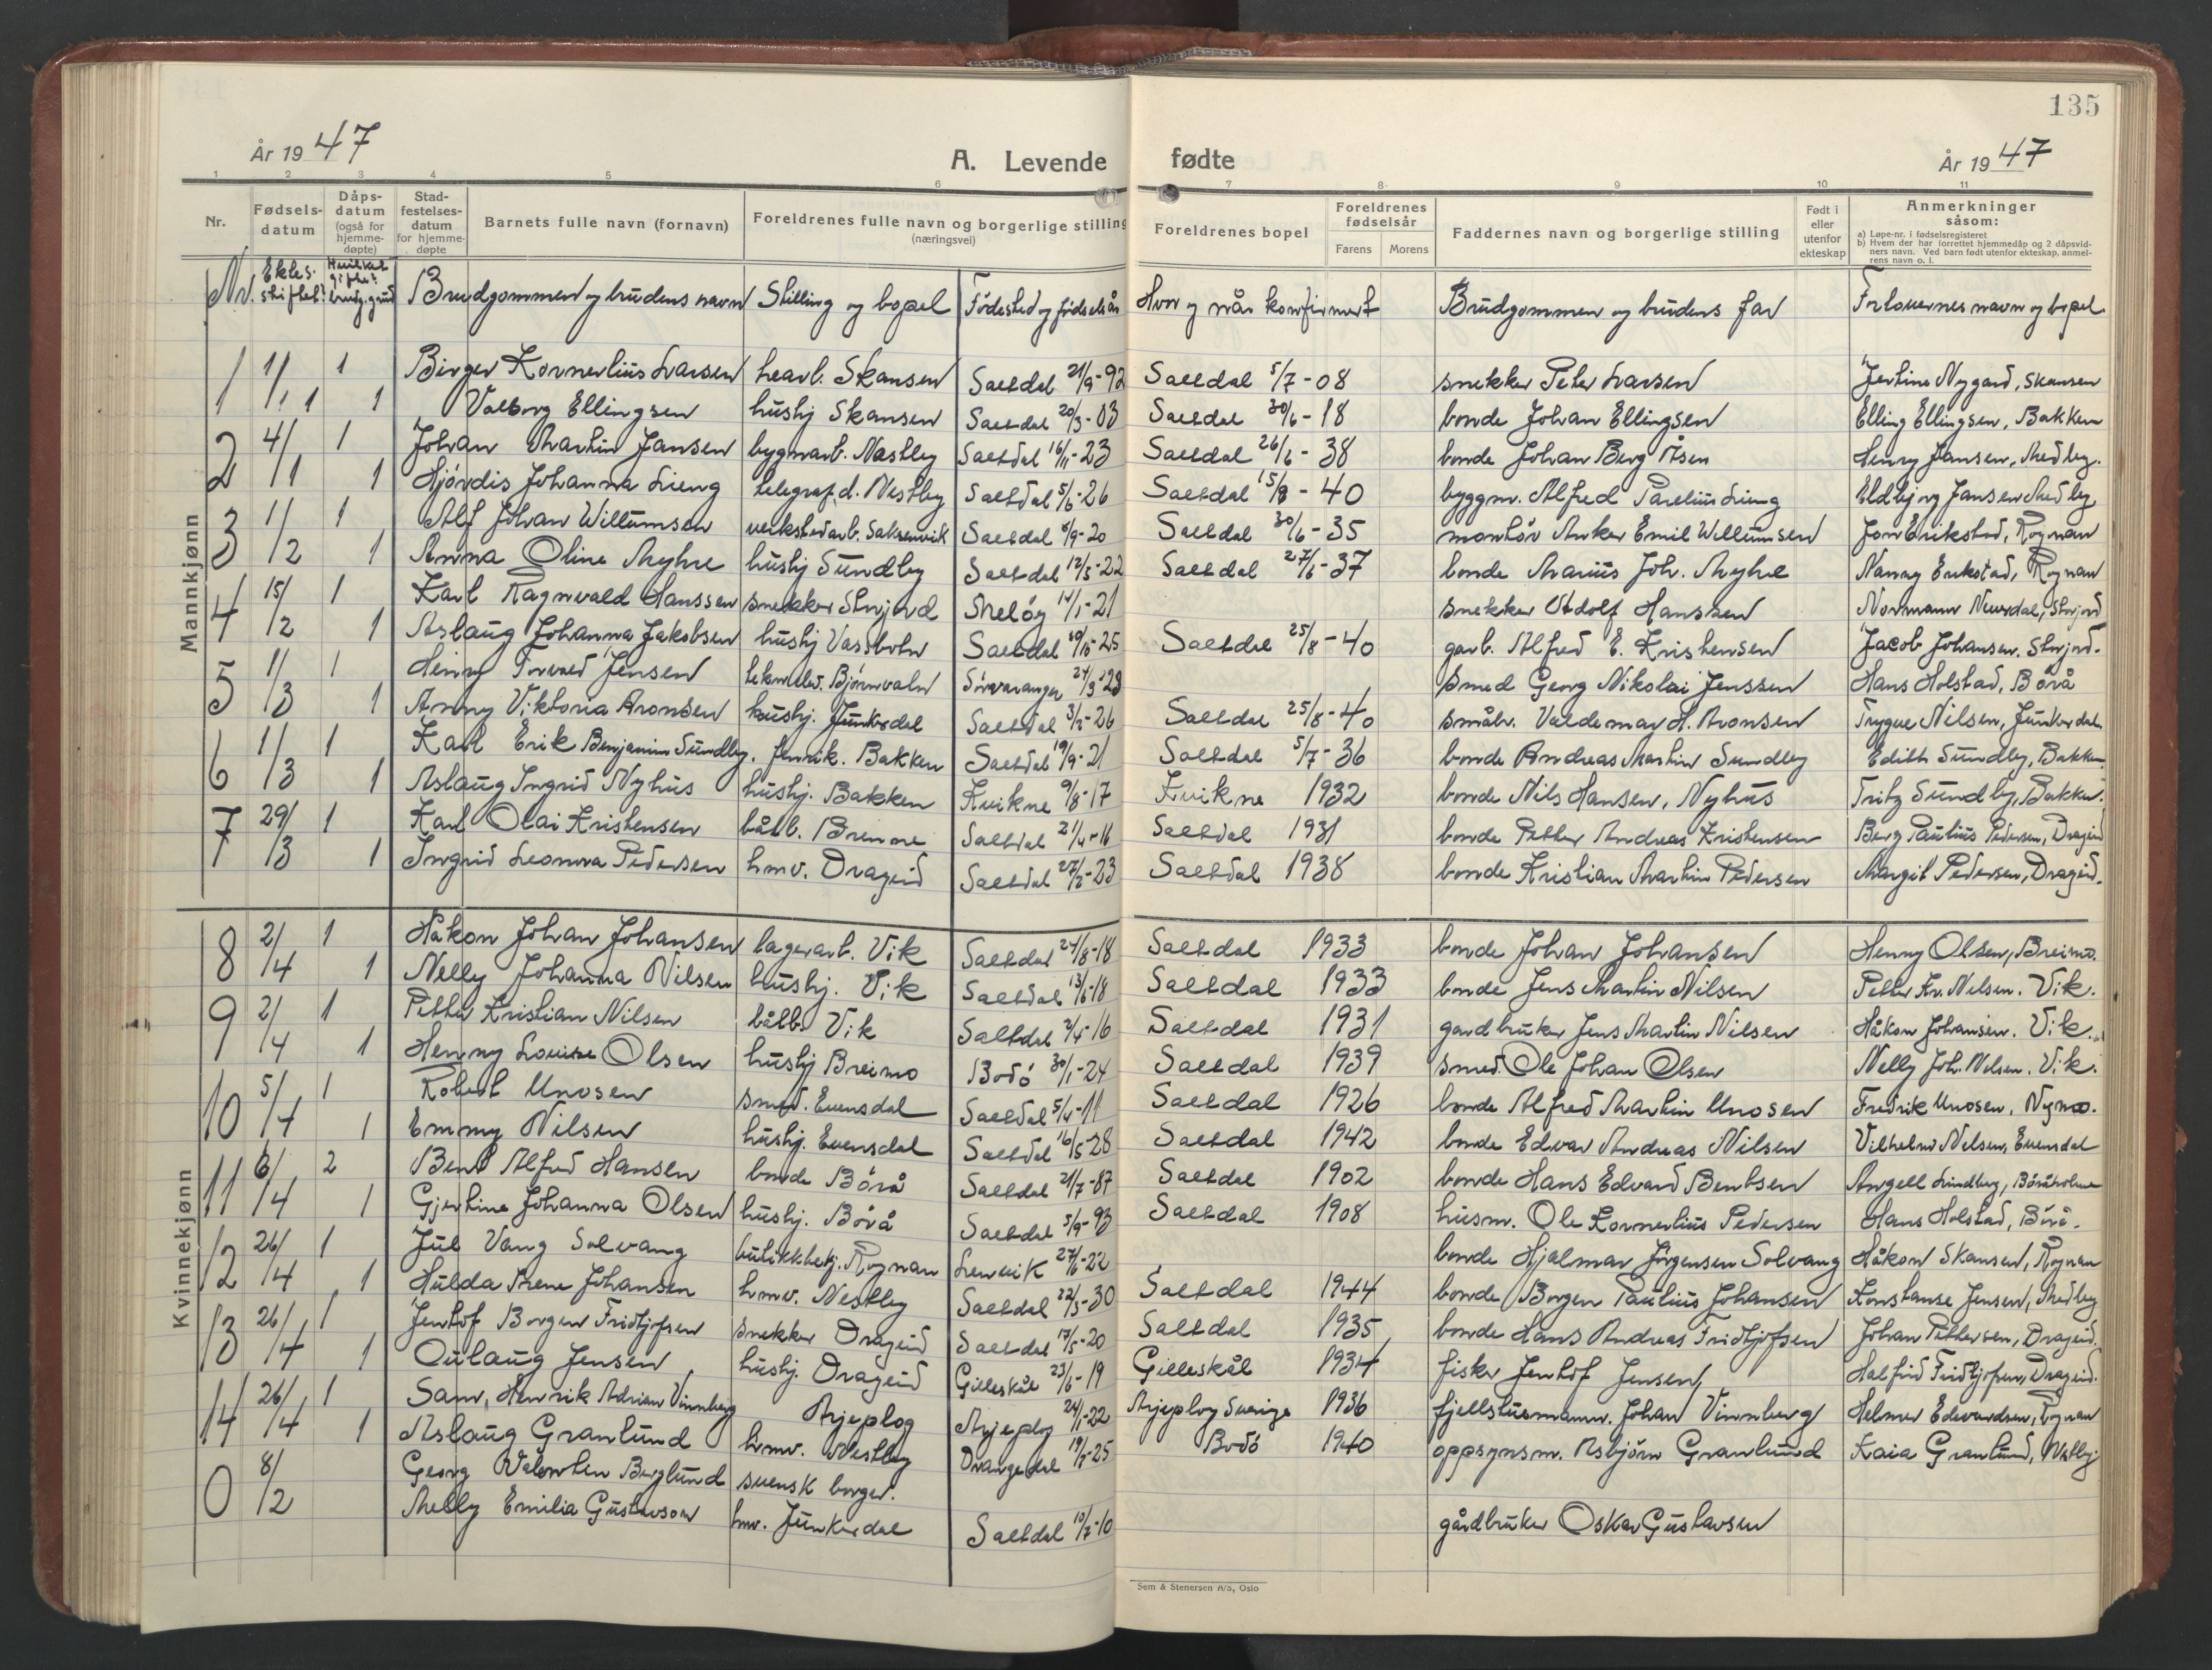 SAT, Ministerialprotokoller, klokkerbøker og fødselsregistre - Nordland, 847/L0680: Klokkerbok nr. 847C08, 1930-1947, s. 135